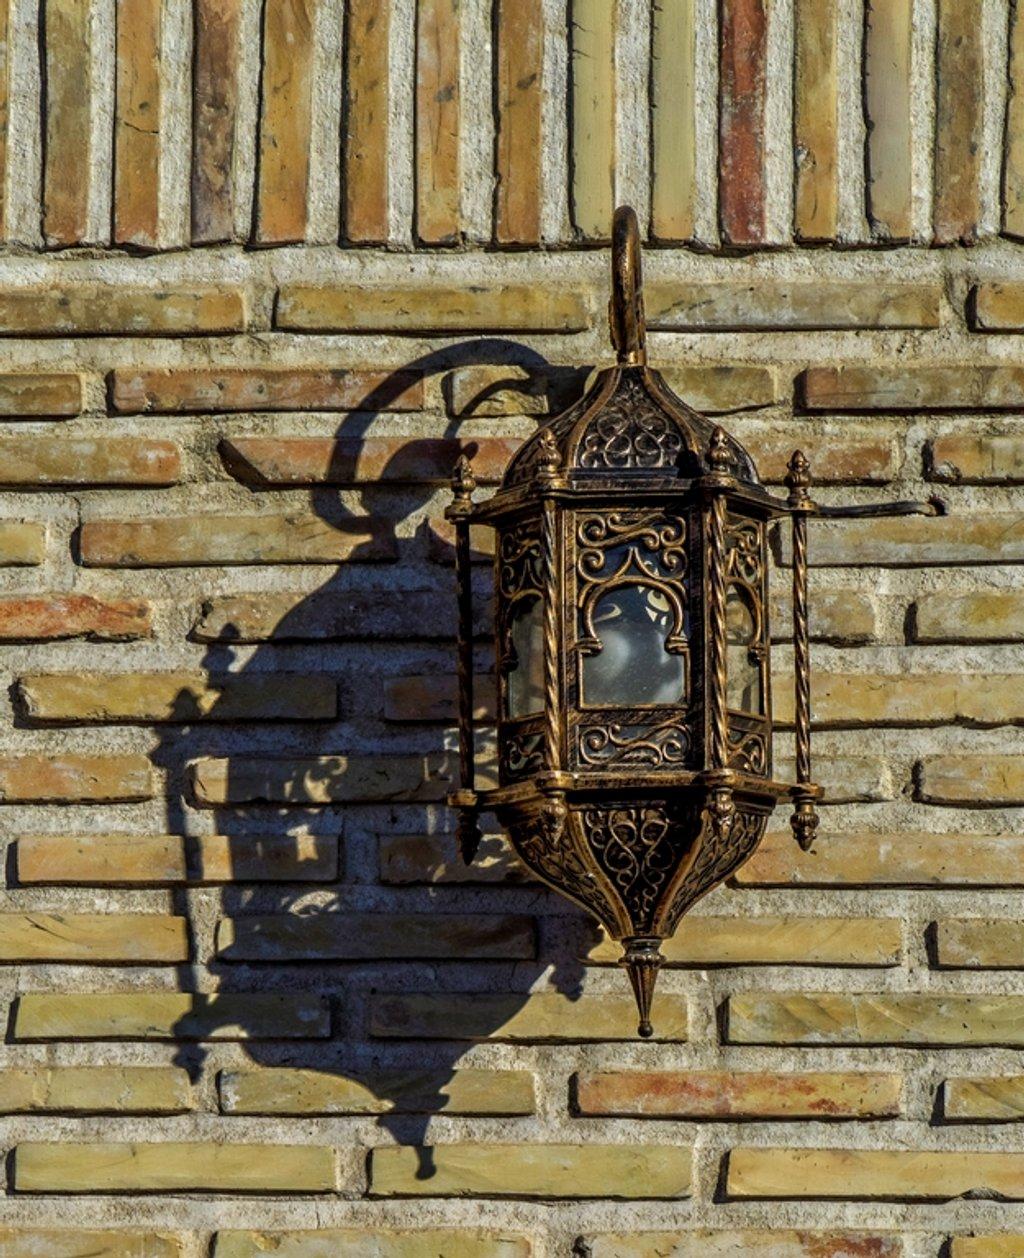 058 - Wall Light by bob65